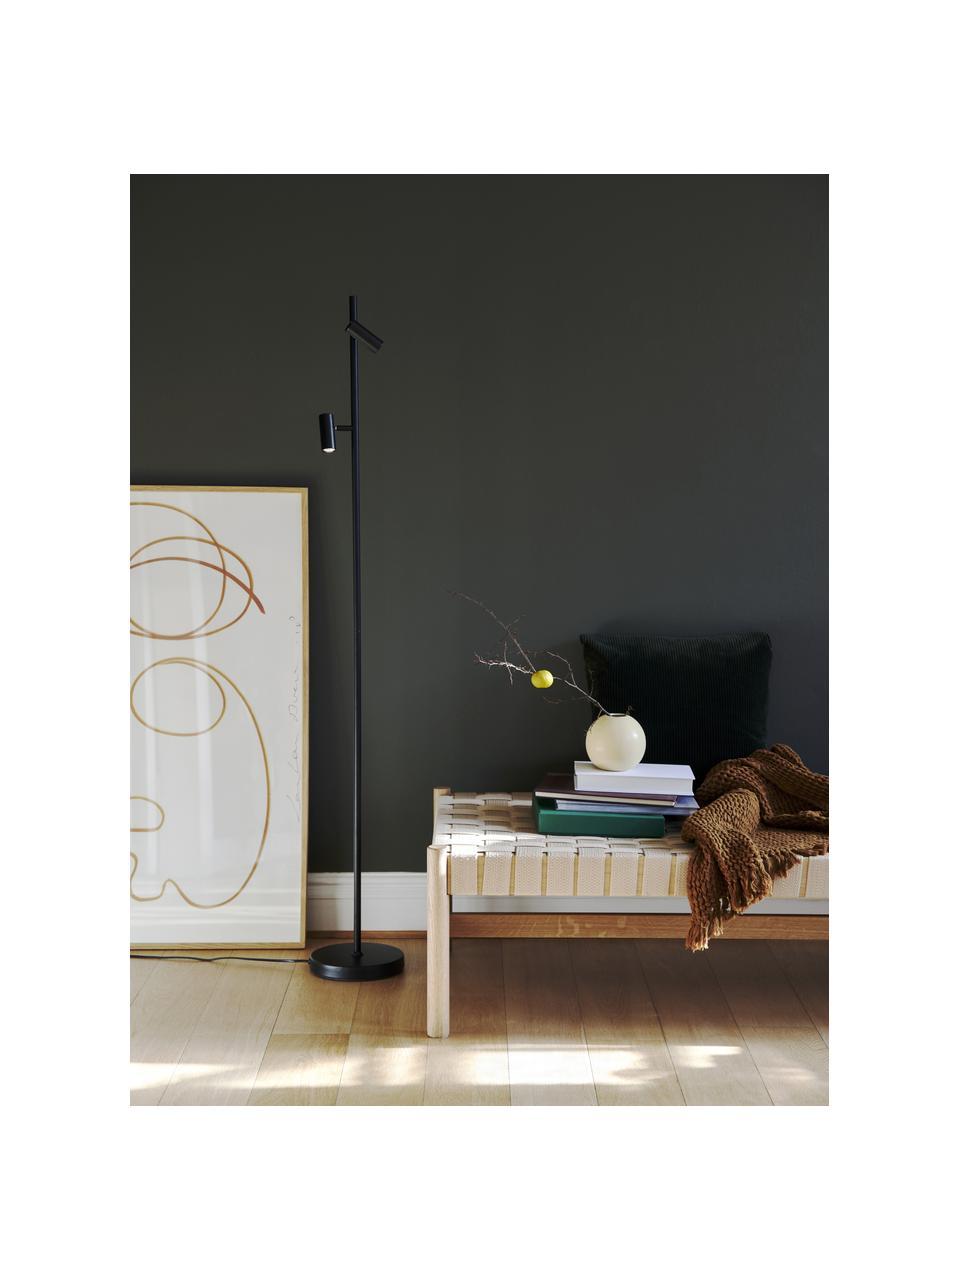 Dimmbare LED-Leselampe Omari in Schwarz, Lampenschirm: Metall, beschichtet, Lampenfuß: Metall, beschichtet, Schwarz, 20 x 141 cm